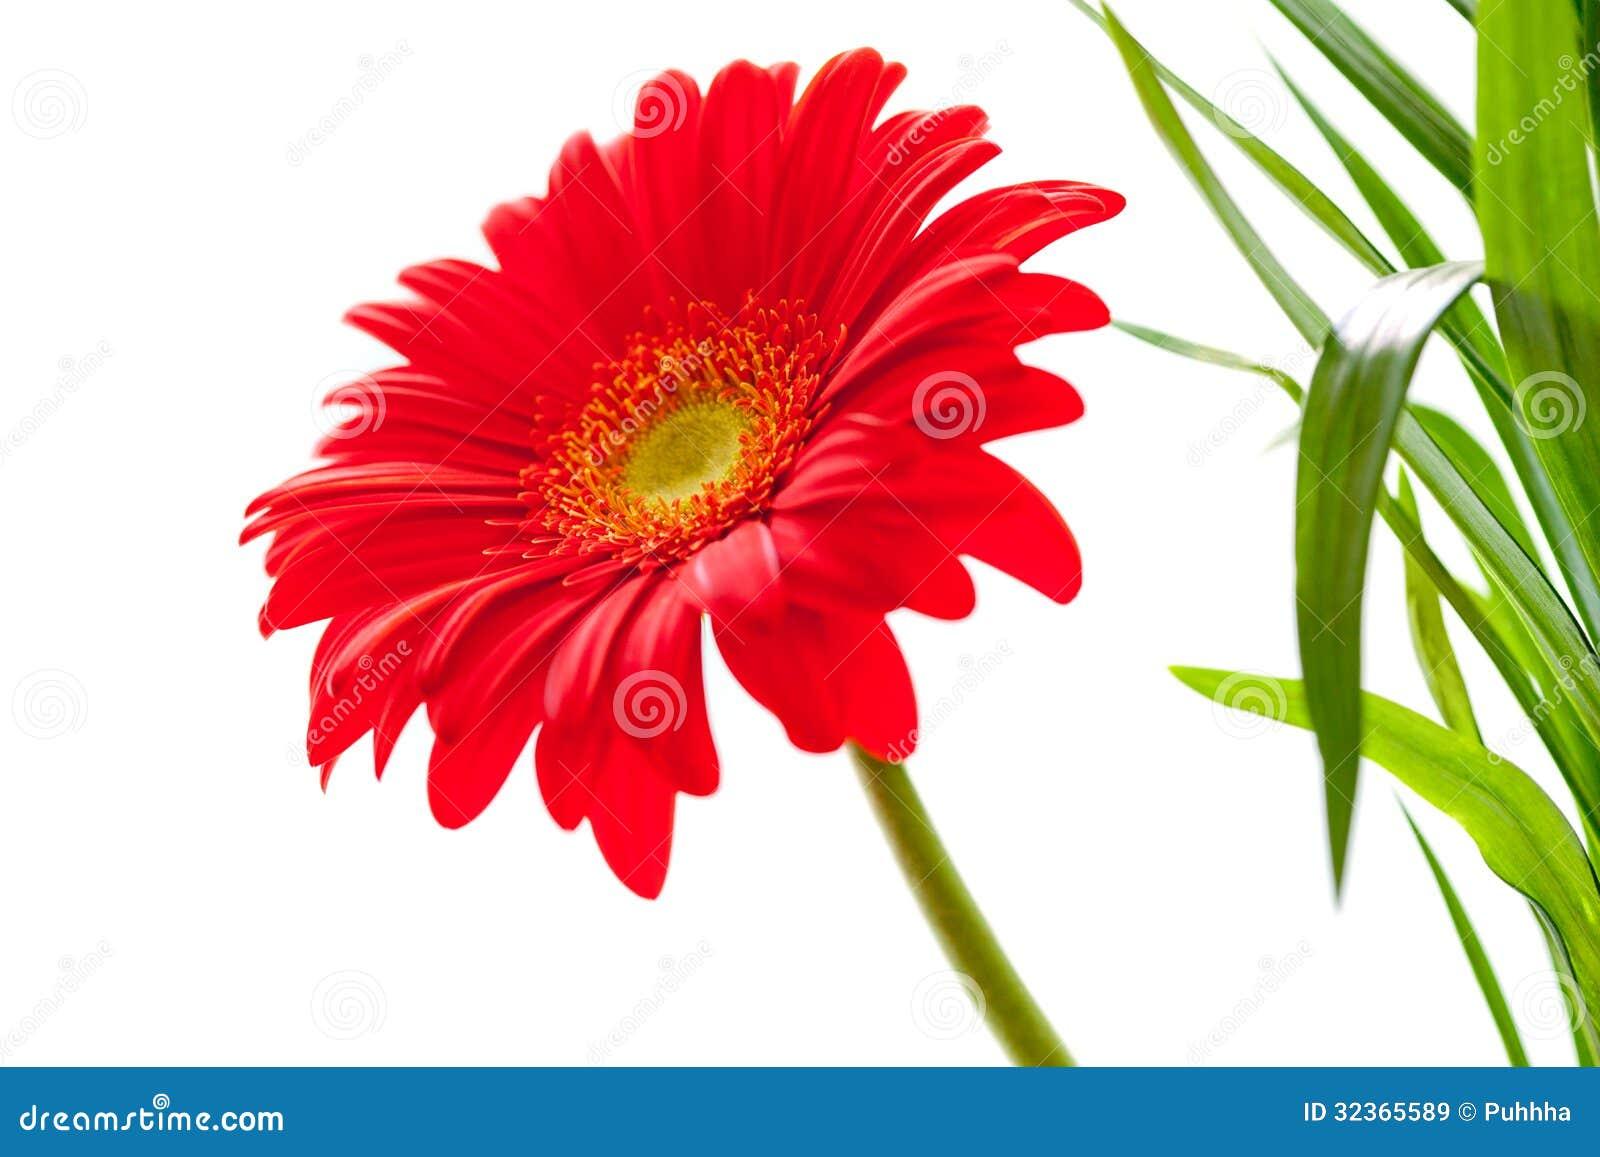 Flower Background. Red Gerbera Flower . Flower Design ...